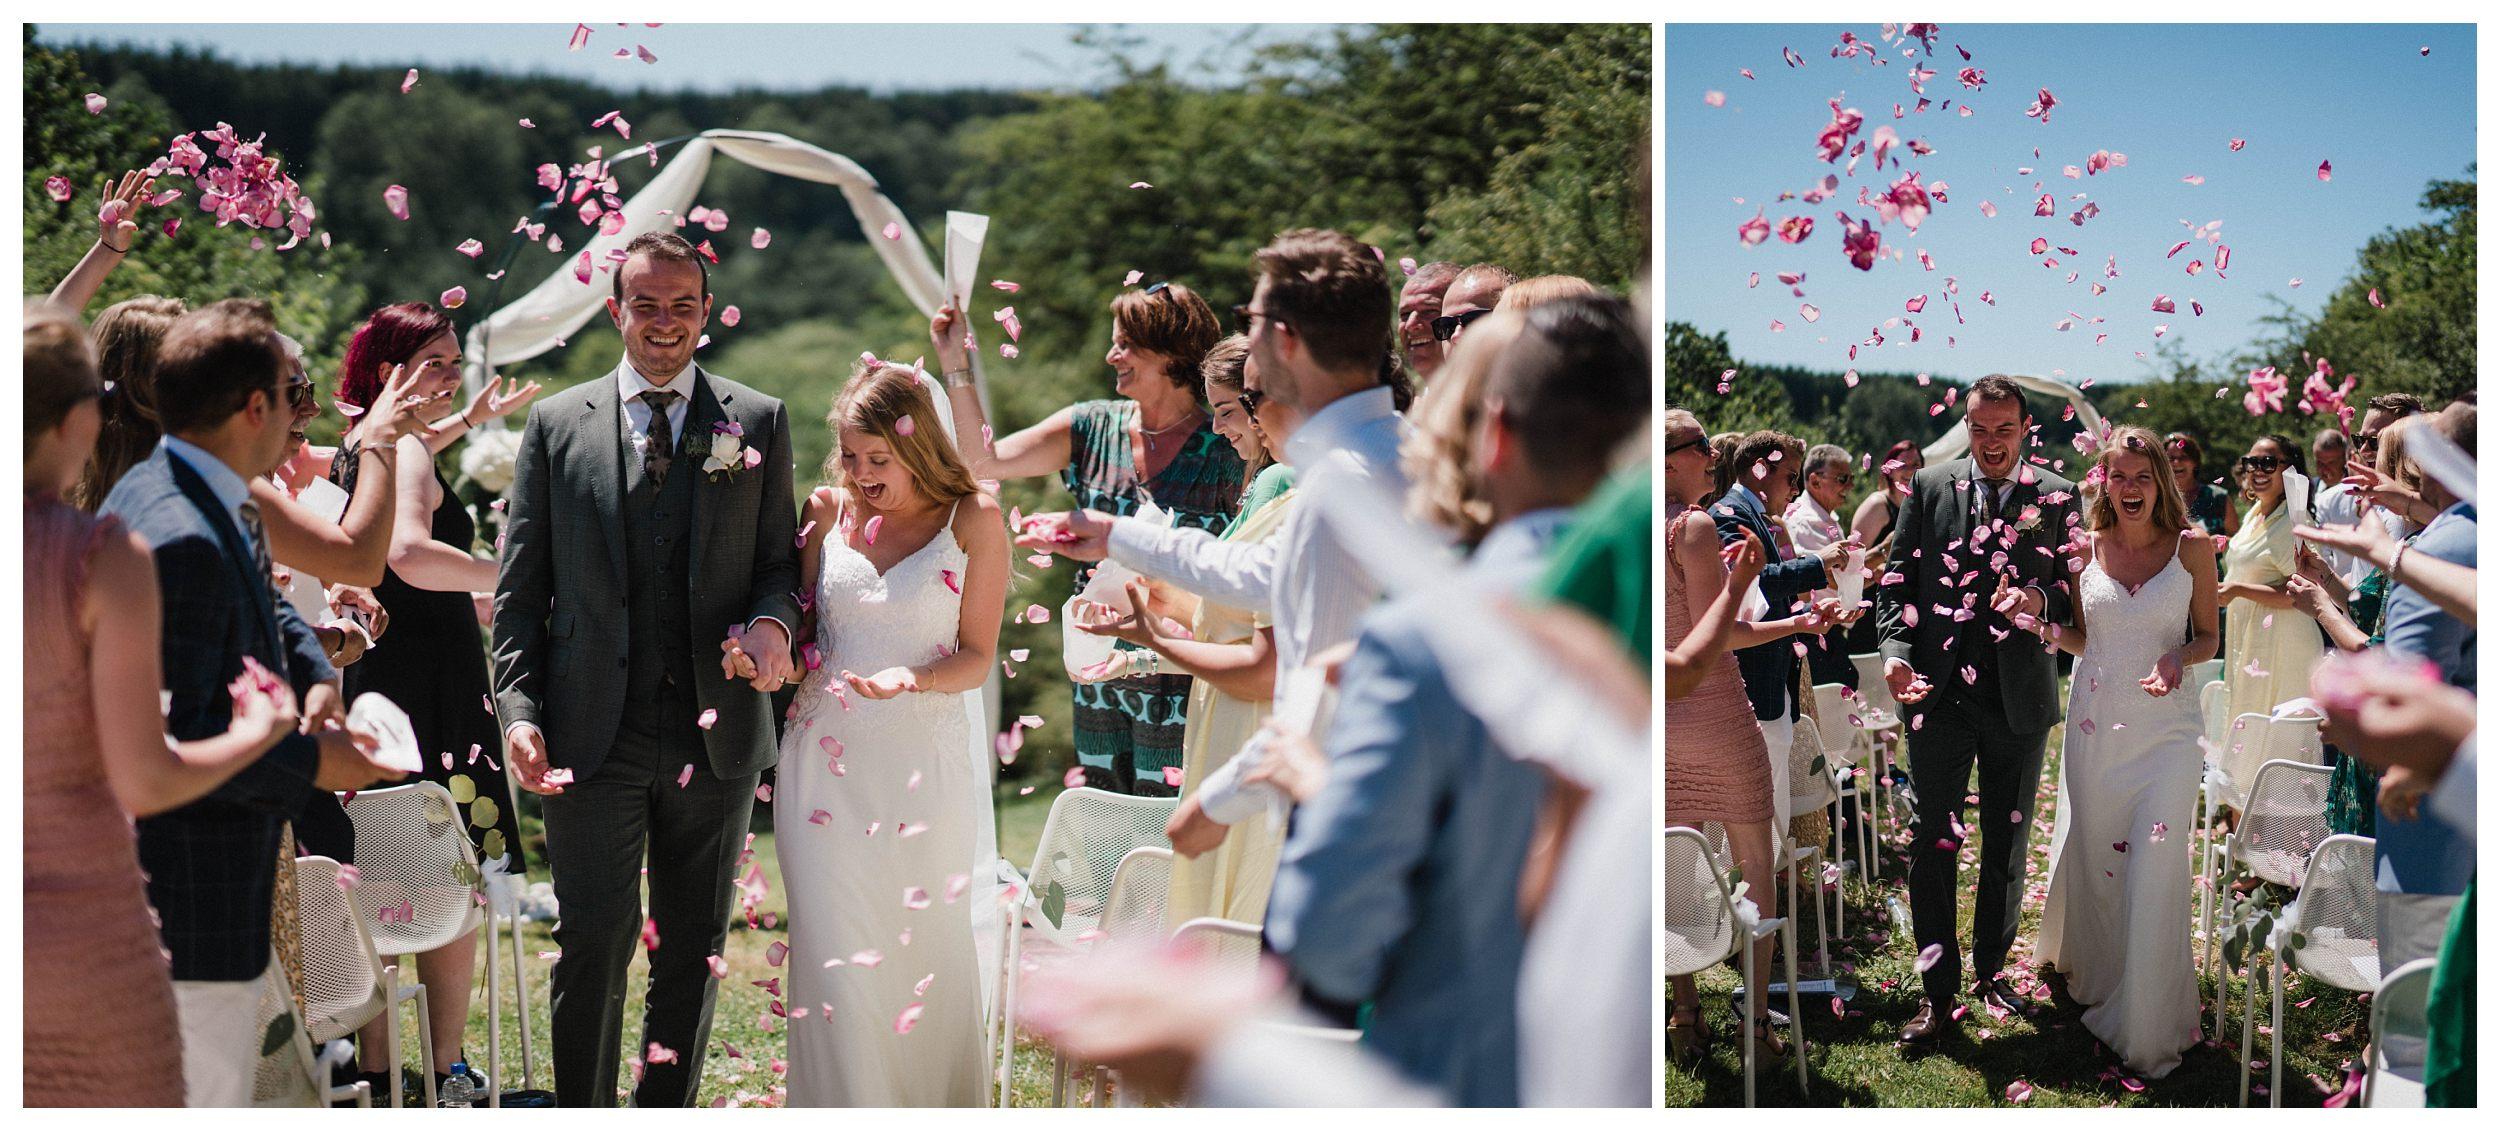 huwelijksfotograaf bruidsfotograaf destinationwedding huwelijksfotografie in ardennen nederland (69).jpg